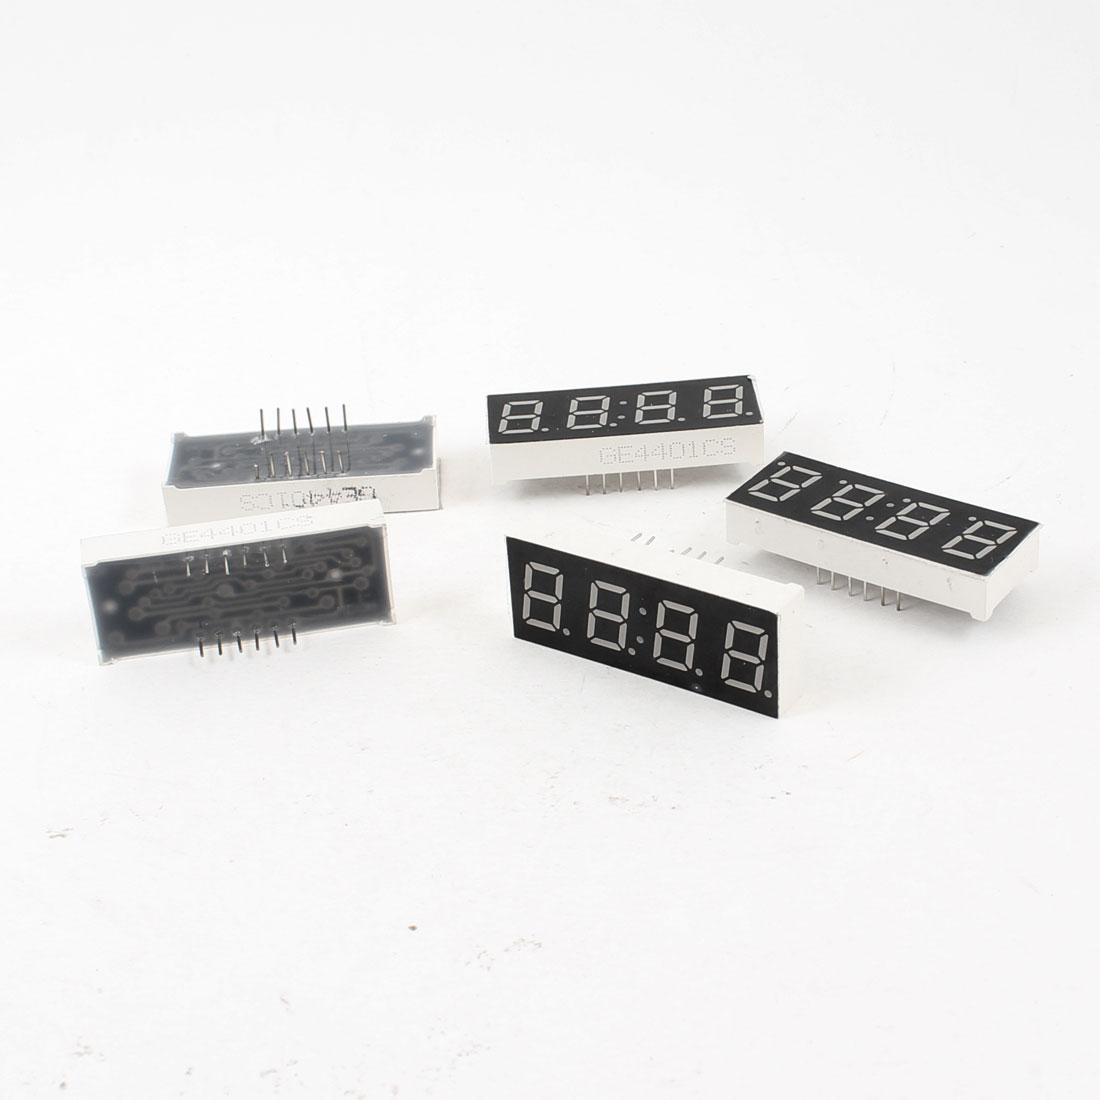 "5 Pcs Common Cathode 12 Terminals 4 Bit 7 Segment 0.4"" Red LED Display Digital Tube"